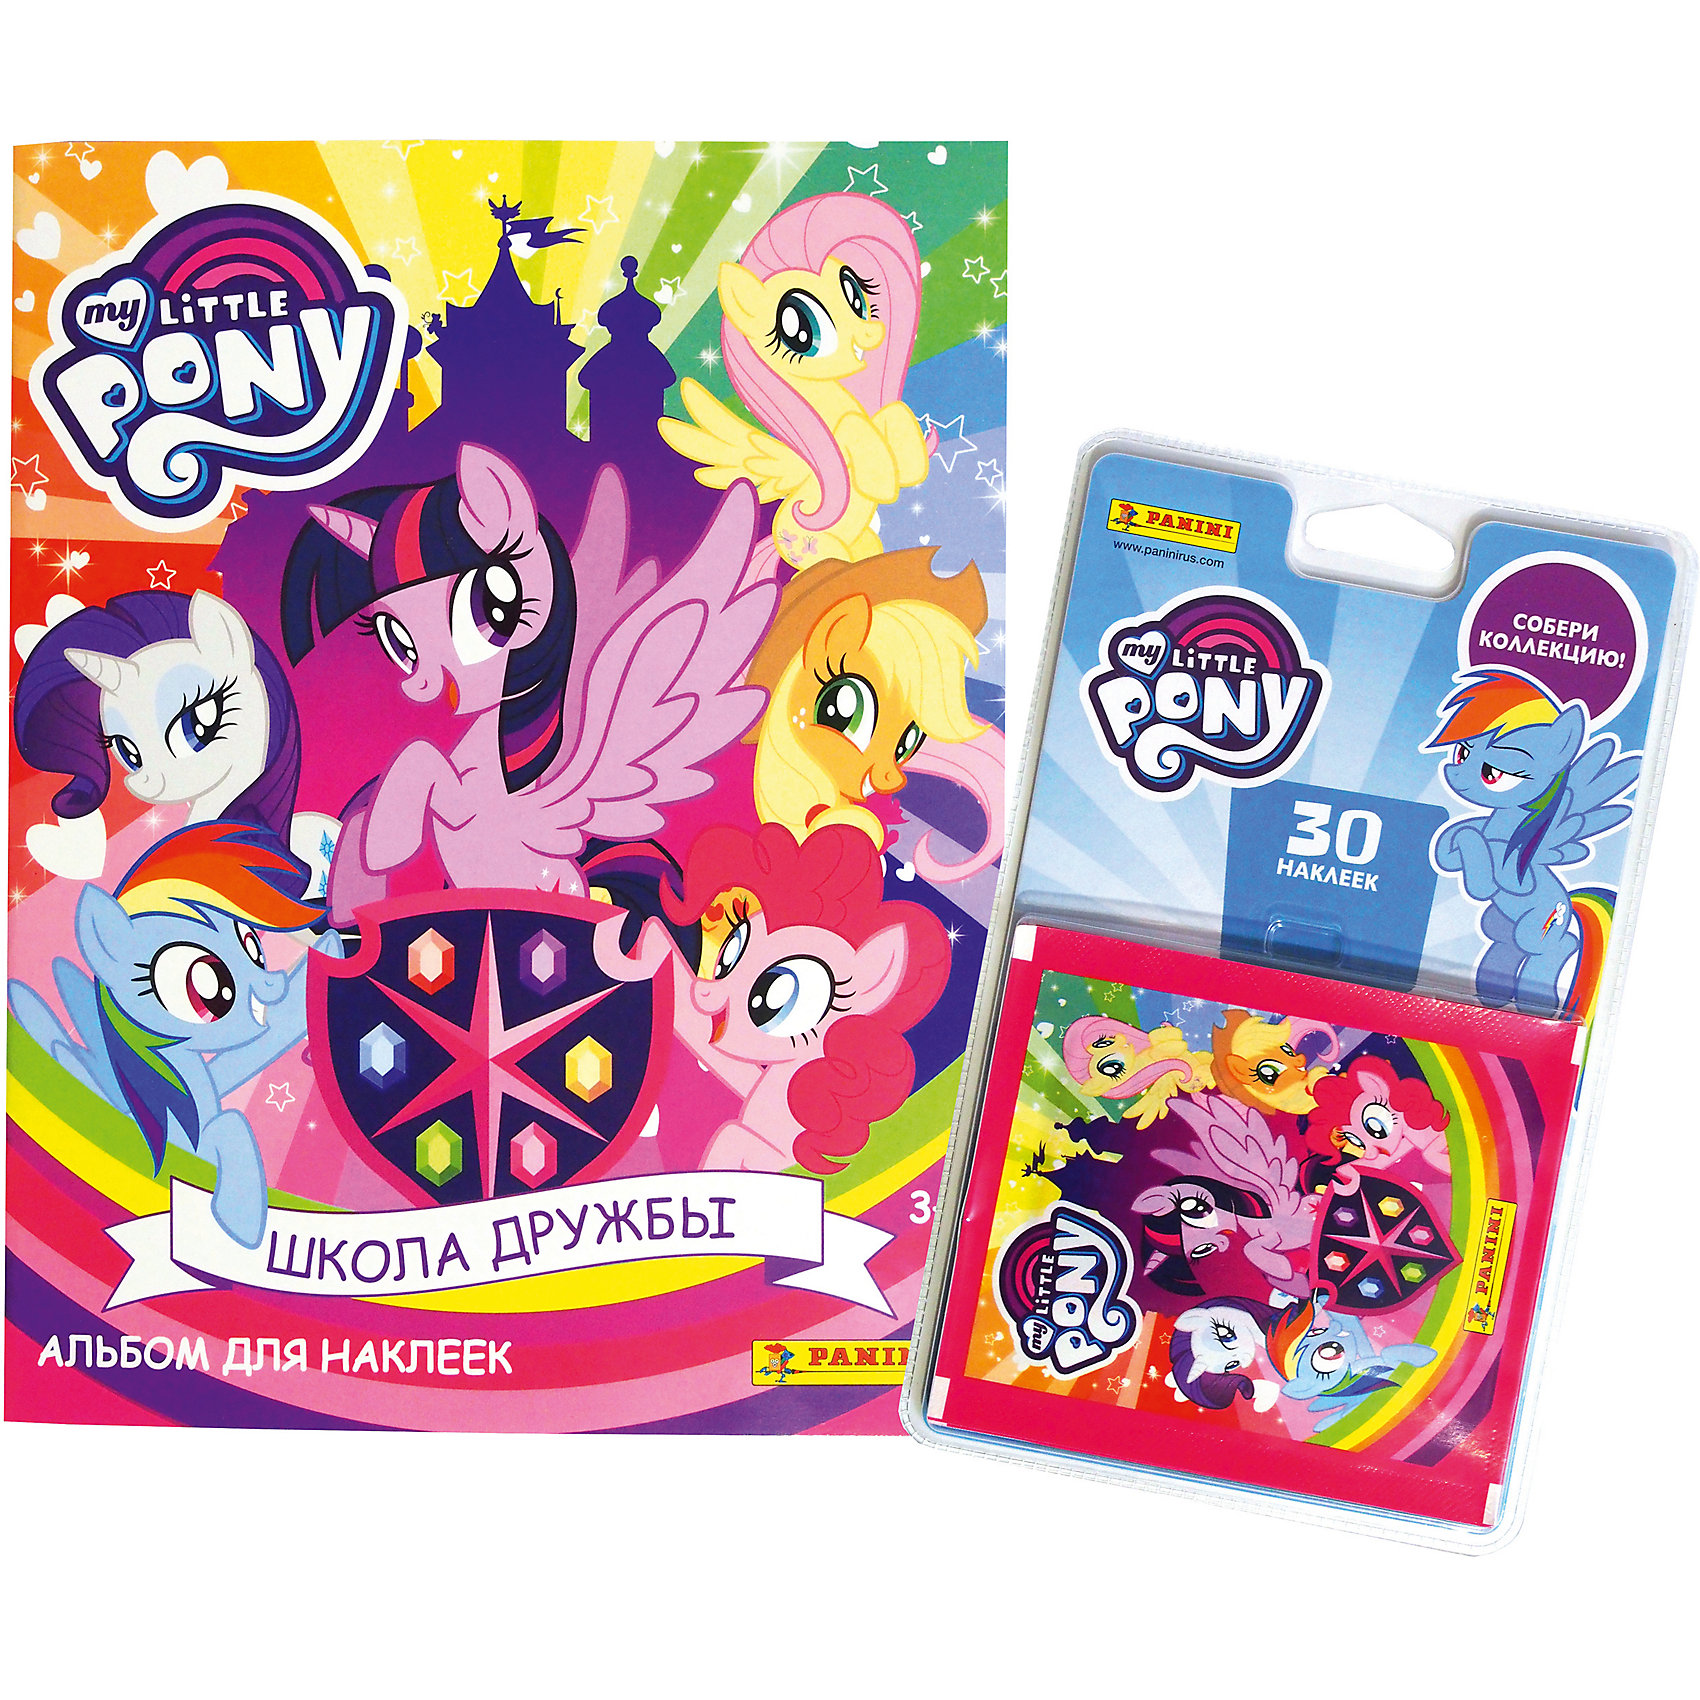 Альбом My Little Pony 2019+Блистер (набор из 6 пакетиков наклеек) по цене 336